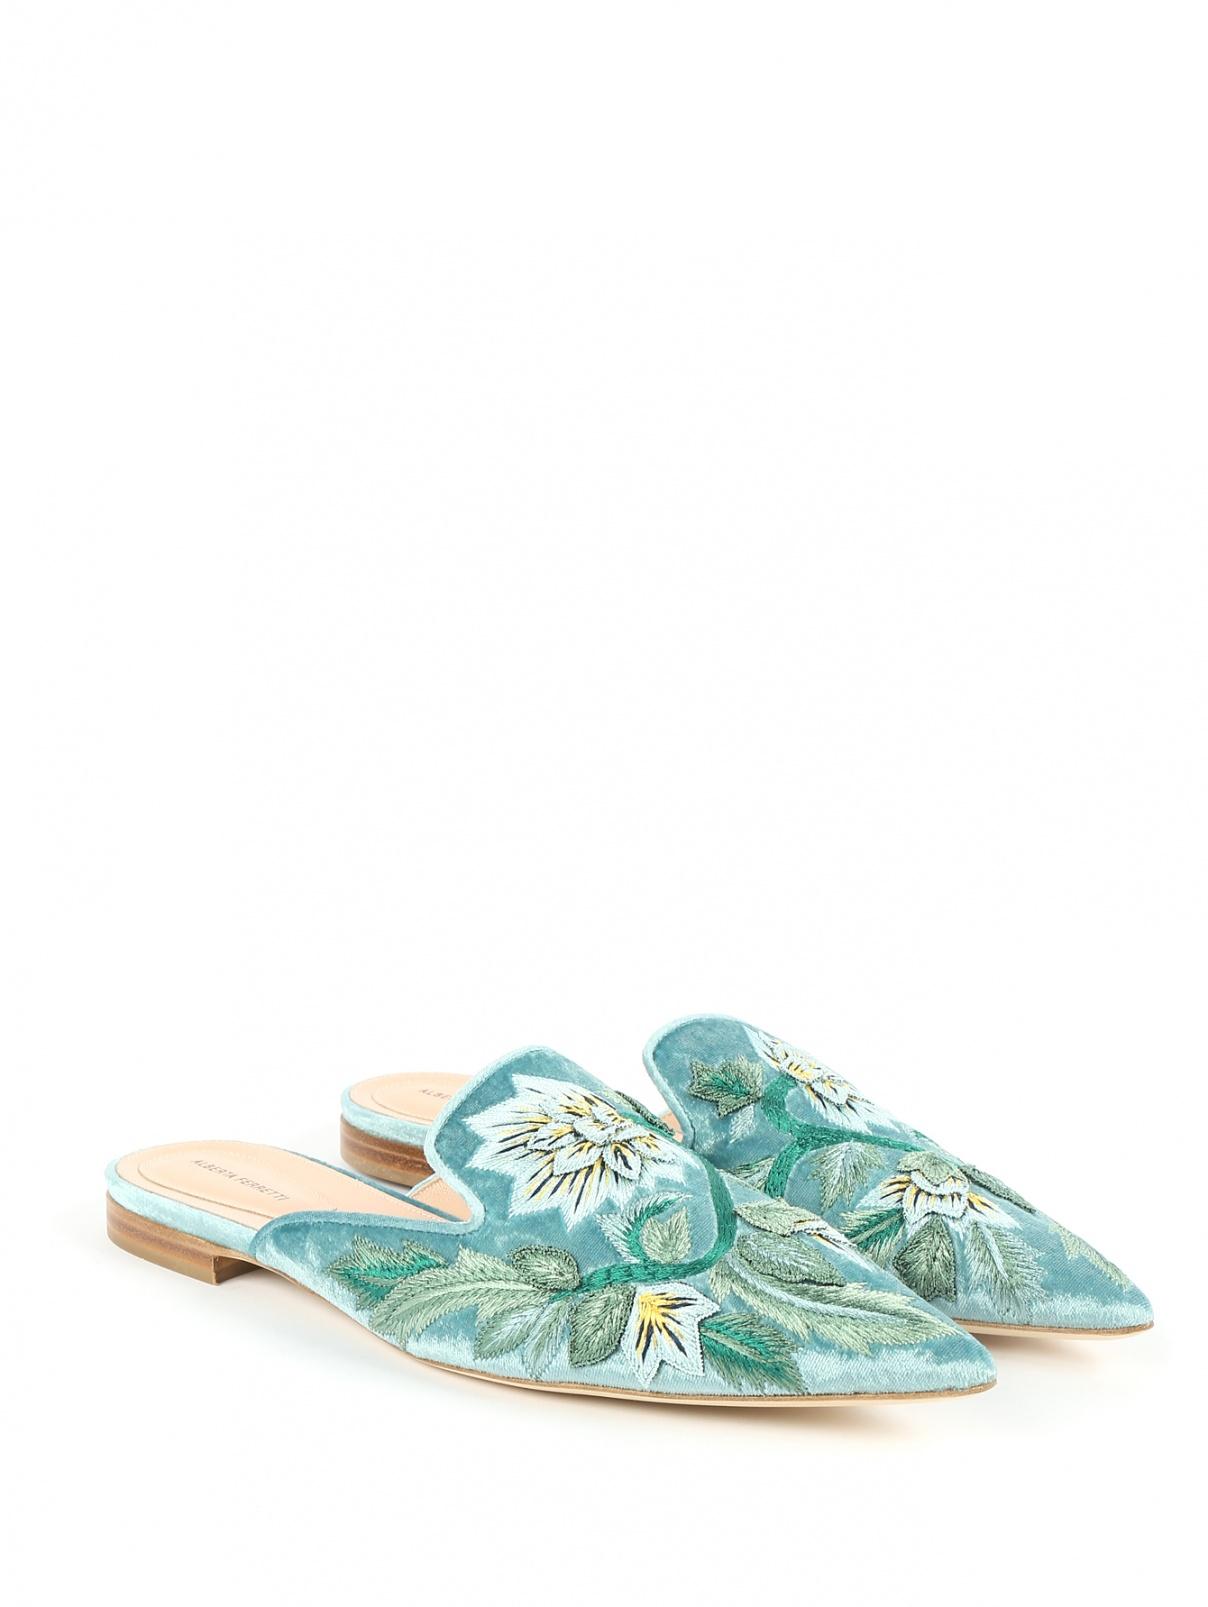 Мюли из кожи и бархата с вышивкой Alberta Ferretti  –  Общий вид